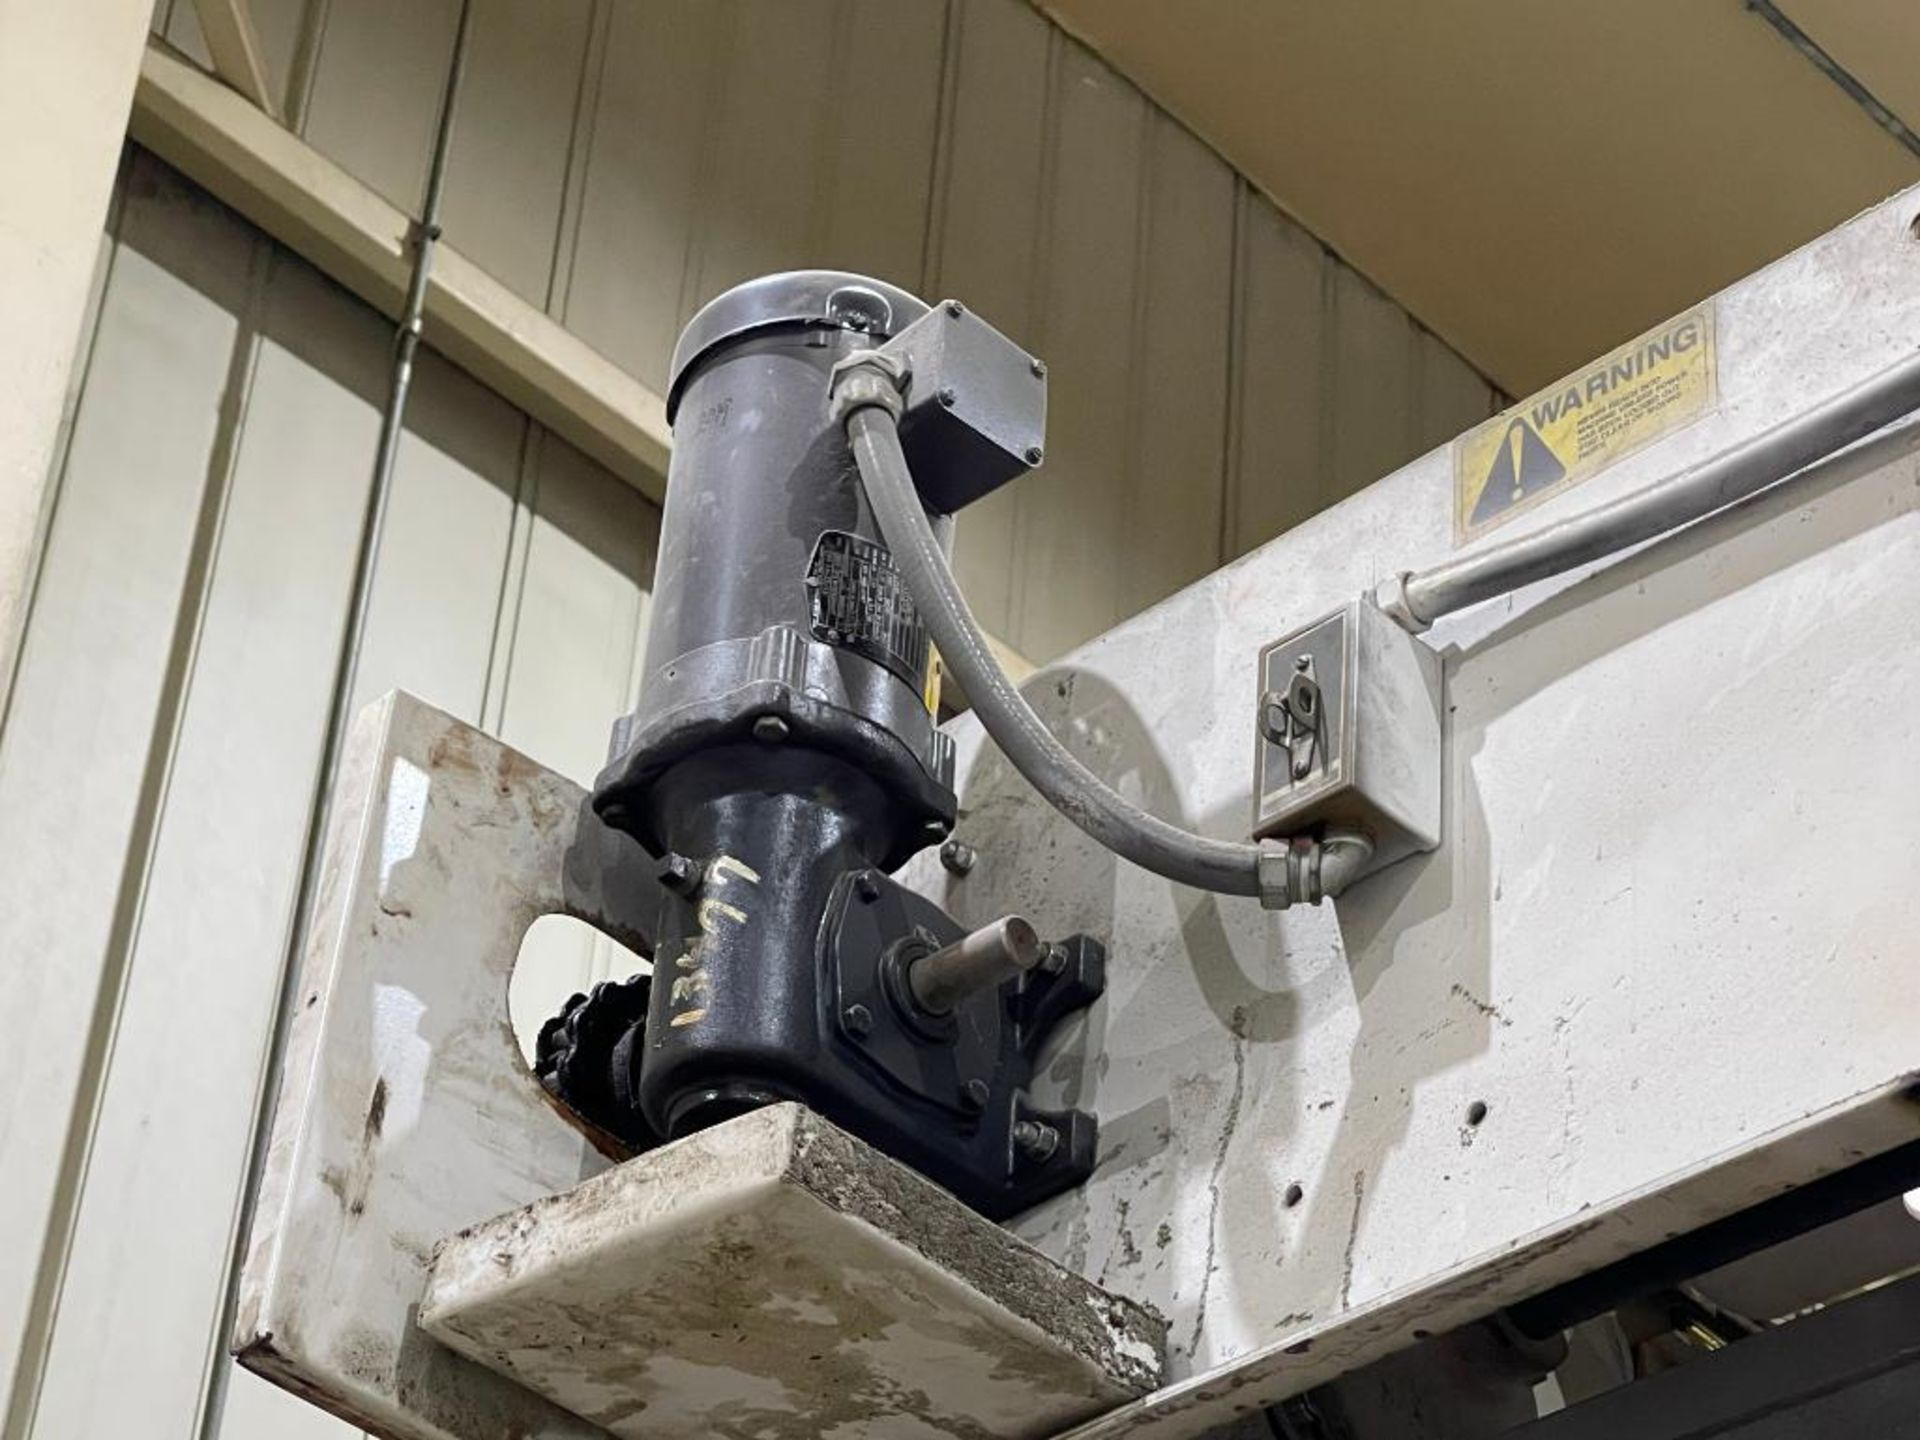 Meyer horizontal bucket elevator, model PQ-172-12-BCS - Image 13 of 19